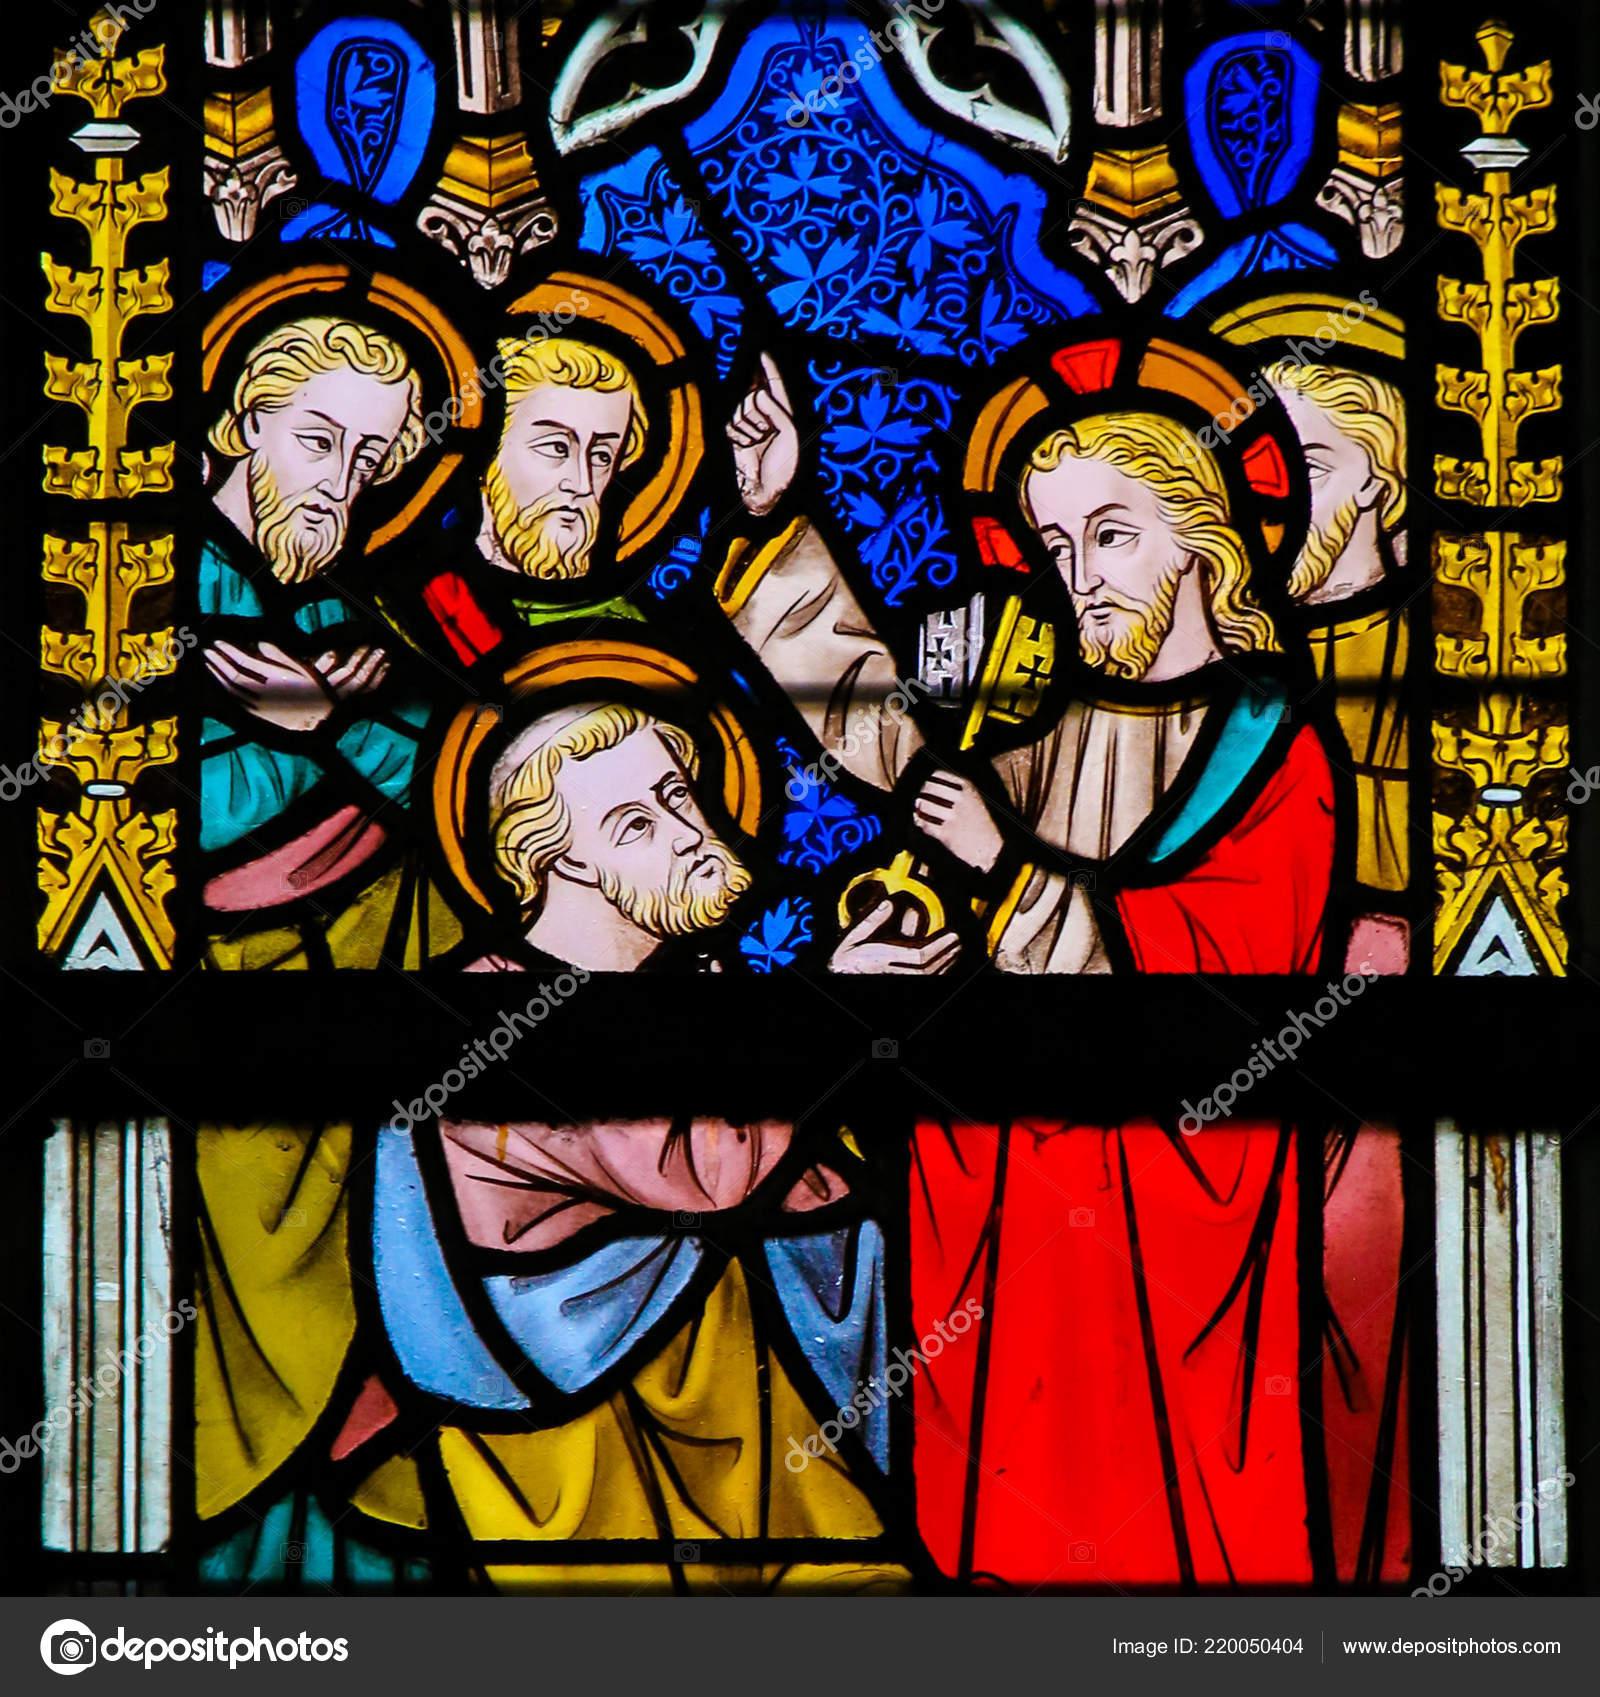 Ghent Belgium December 2016 Stained Glass Depicting Jesus Handing